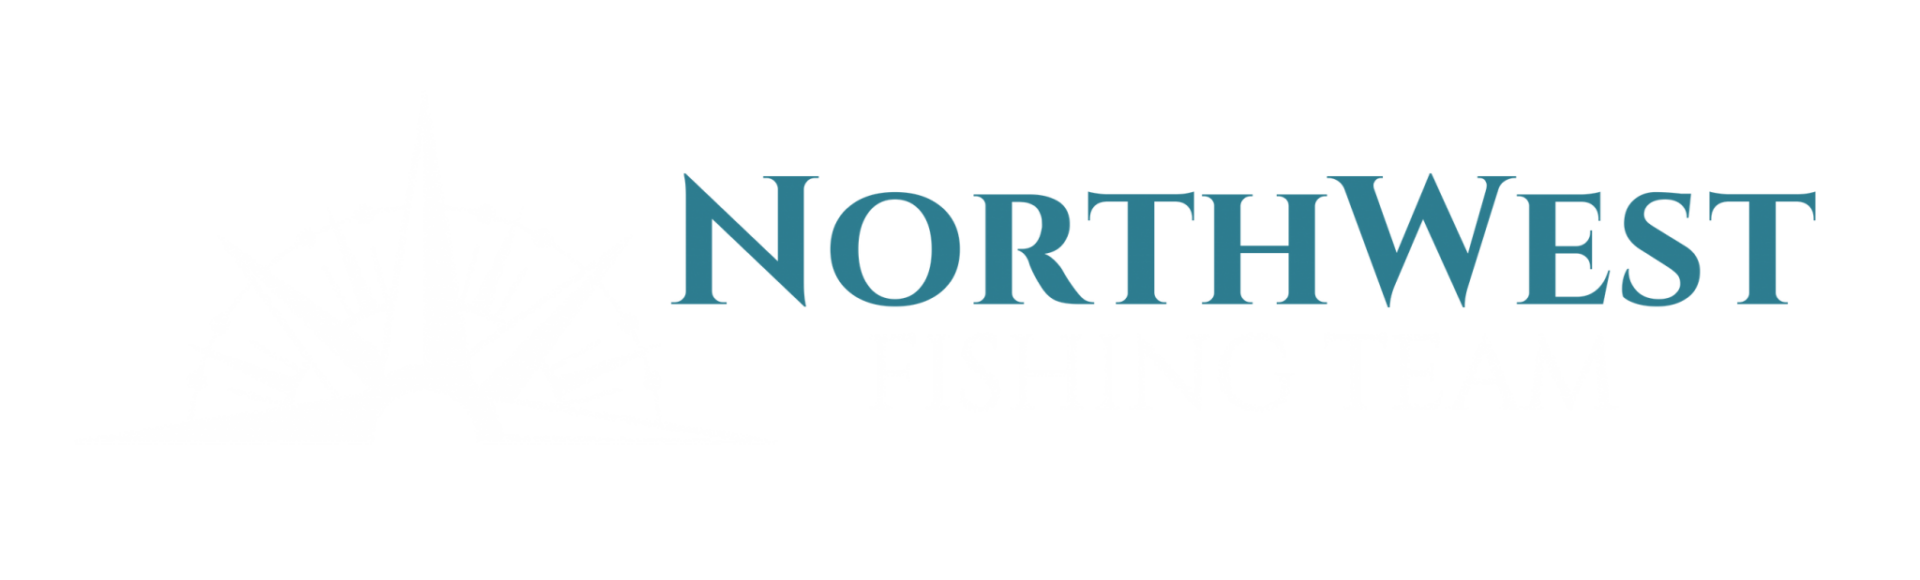 northwest-fishing-team-haida-gwaii-british-columbia-horizontal-logo